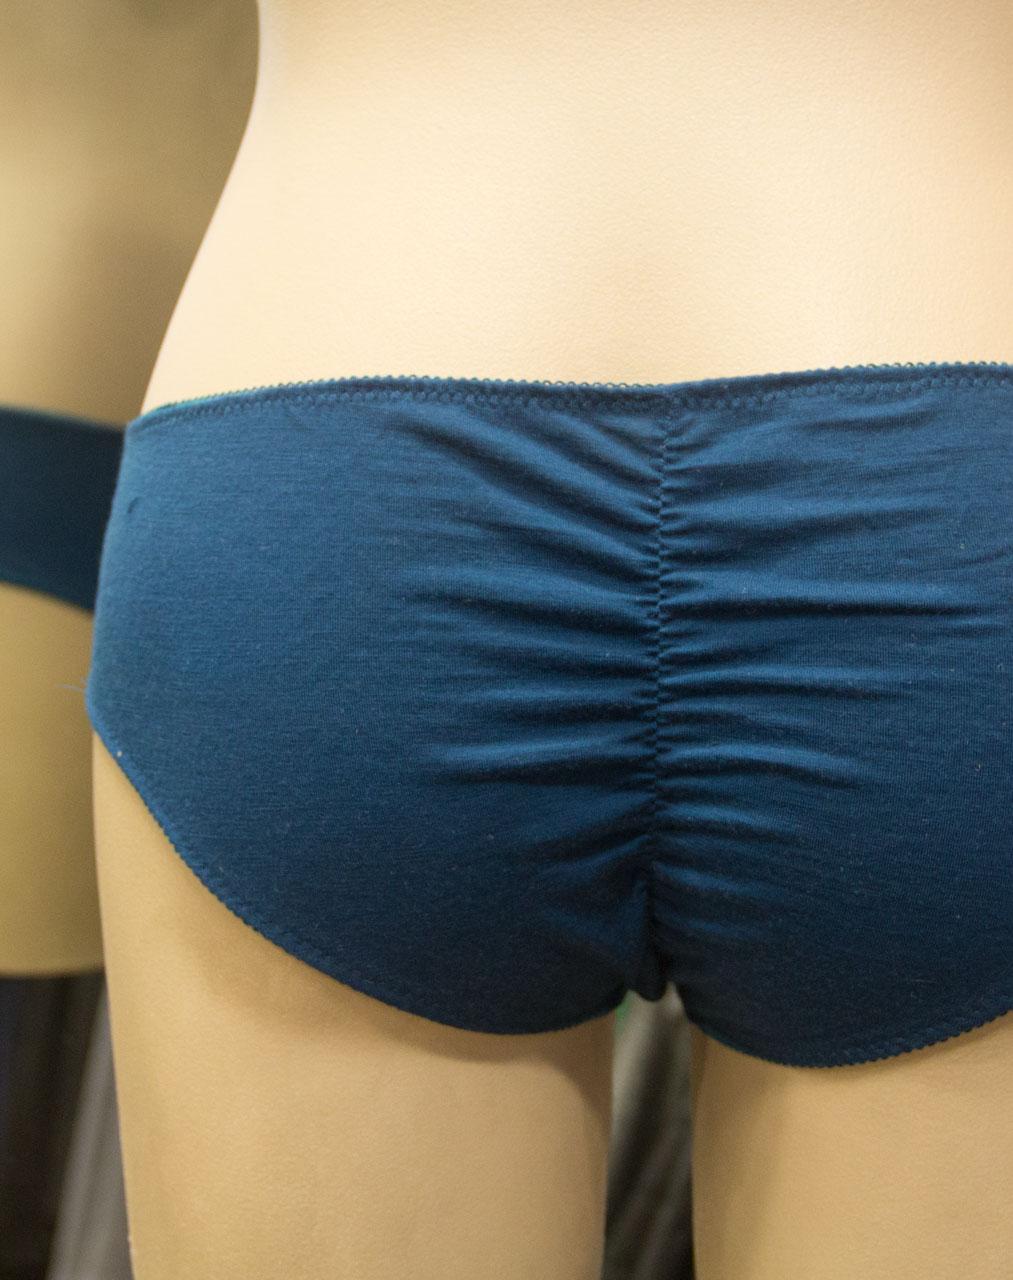 ruched panty variation.jpg